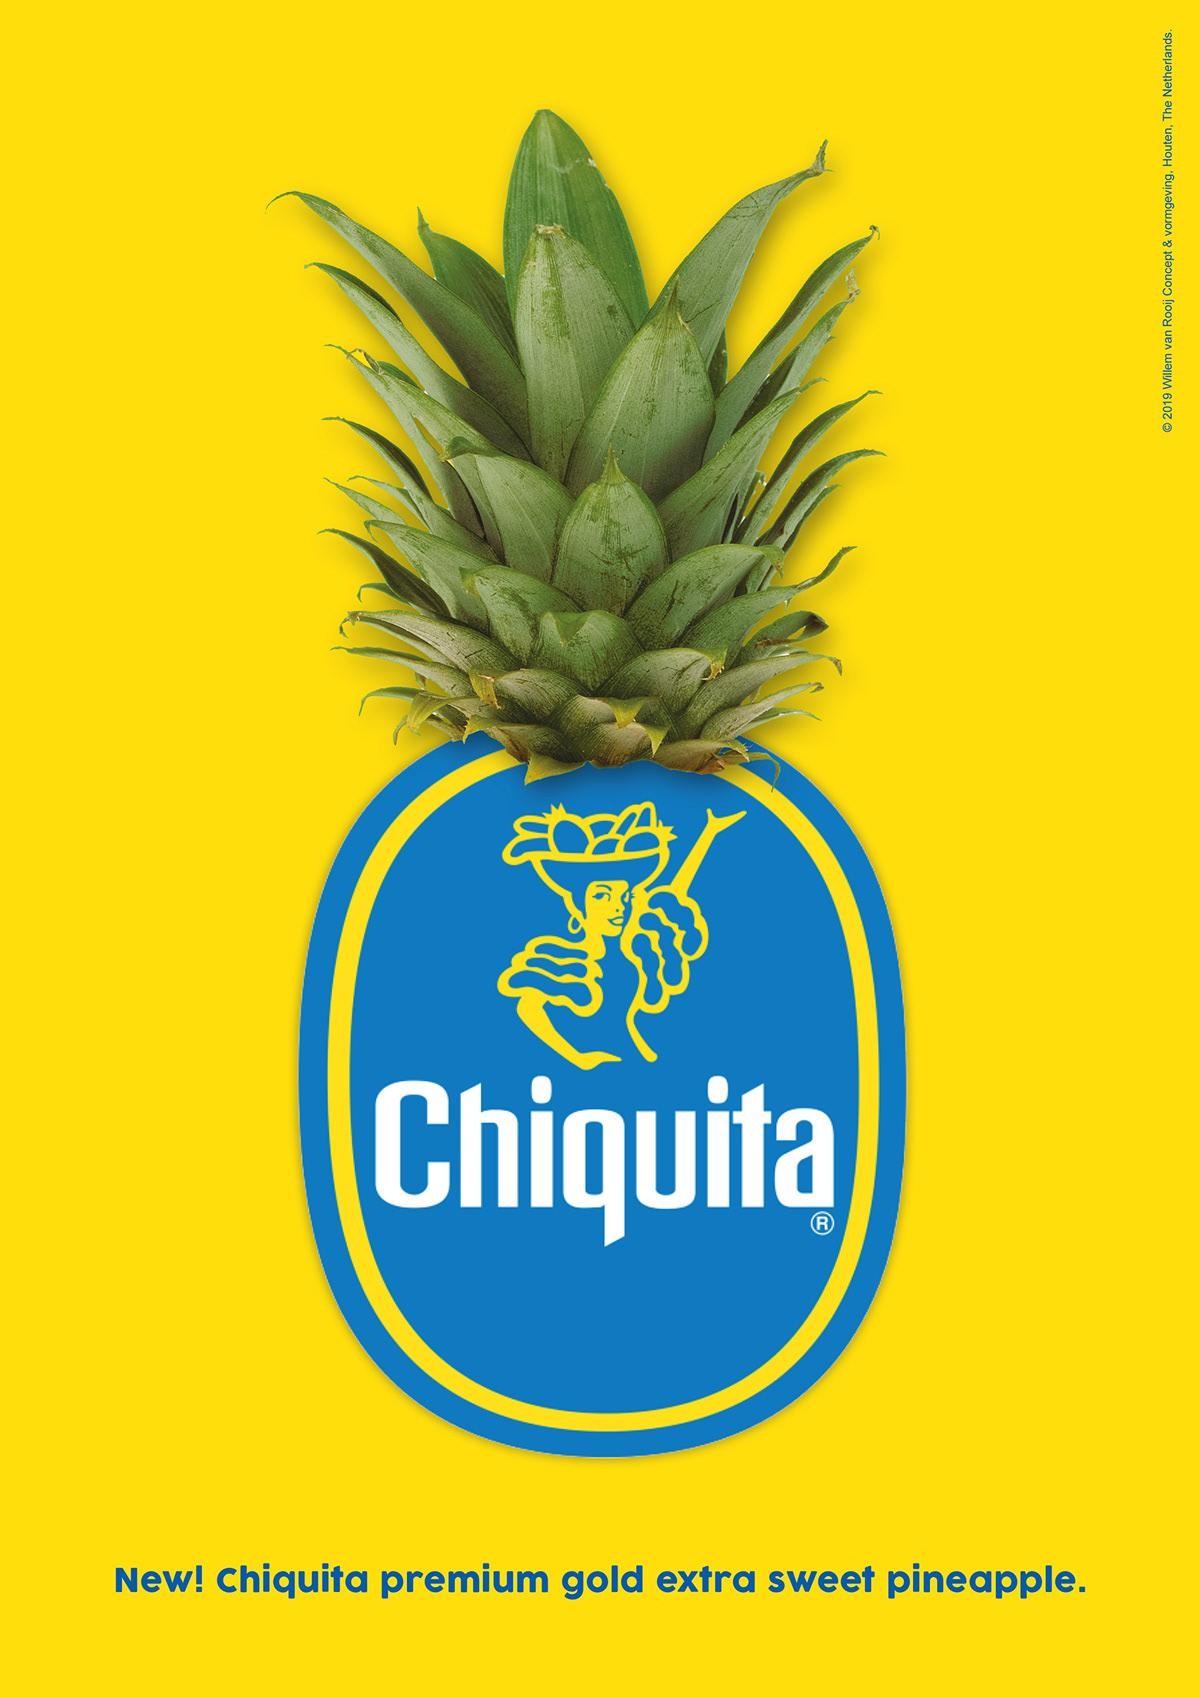 Chiquita logo shaped pineapple